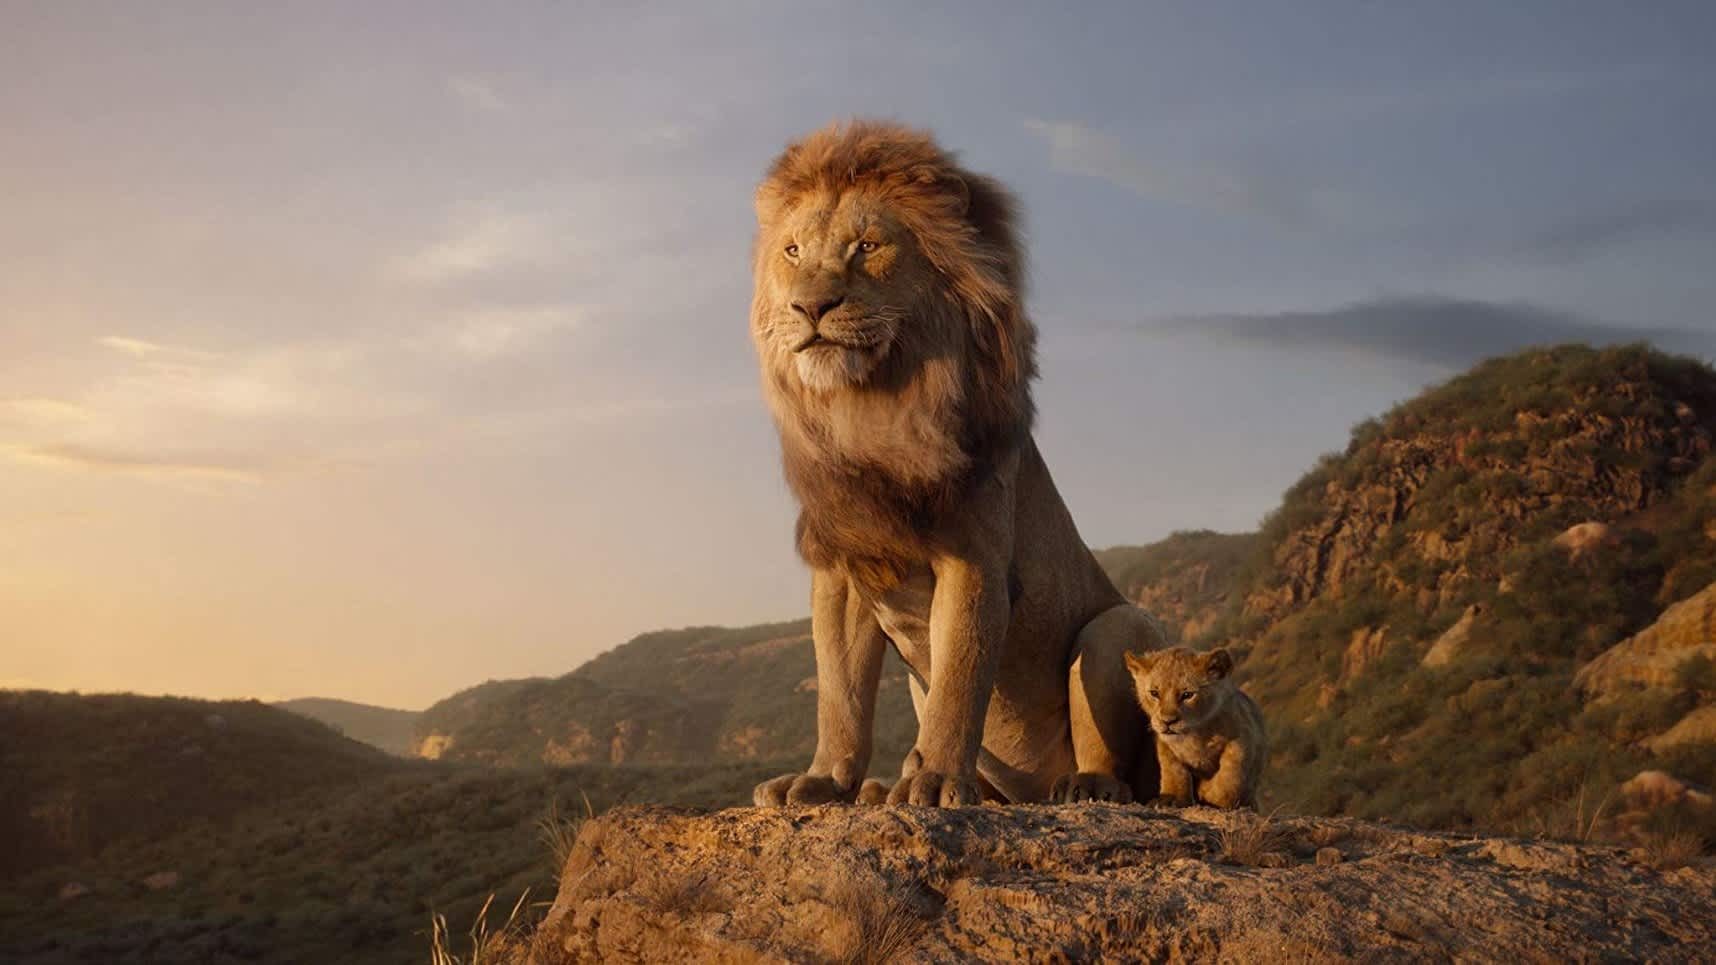 Disney's 'The Lion King' tops $1 billion at the box office thumbnail